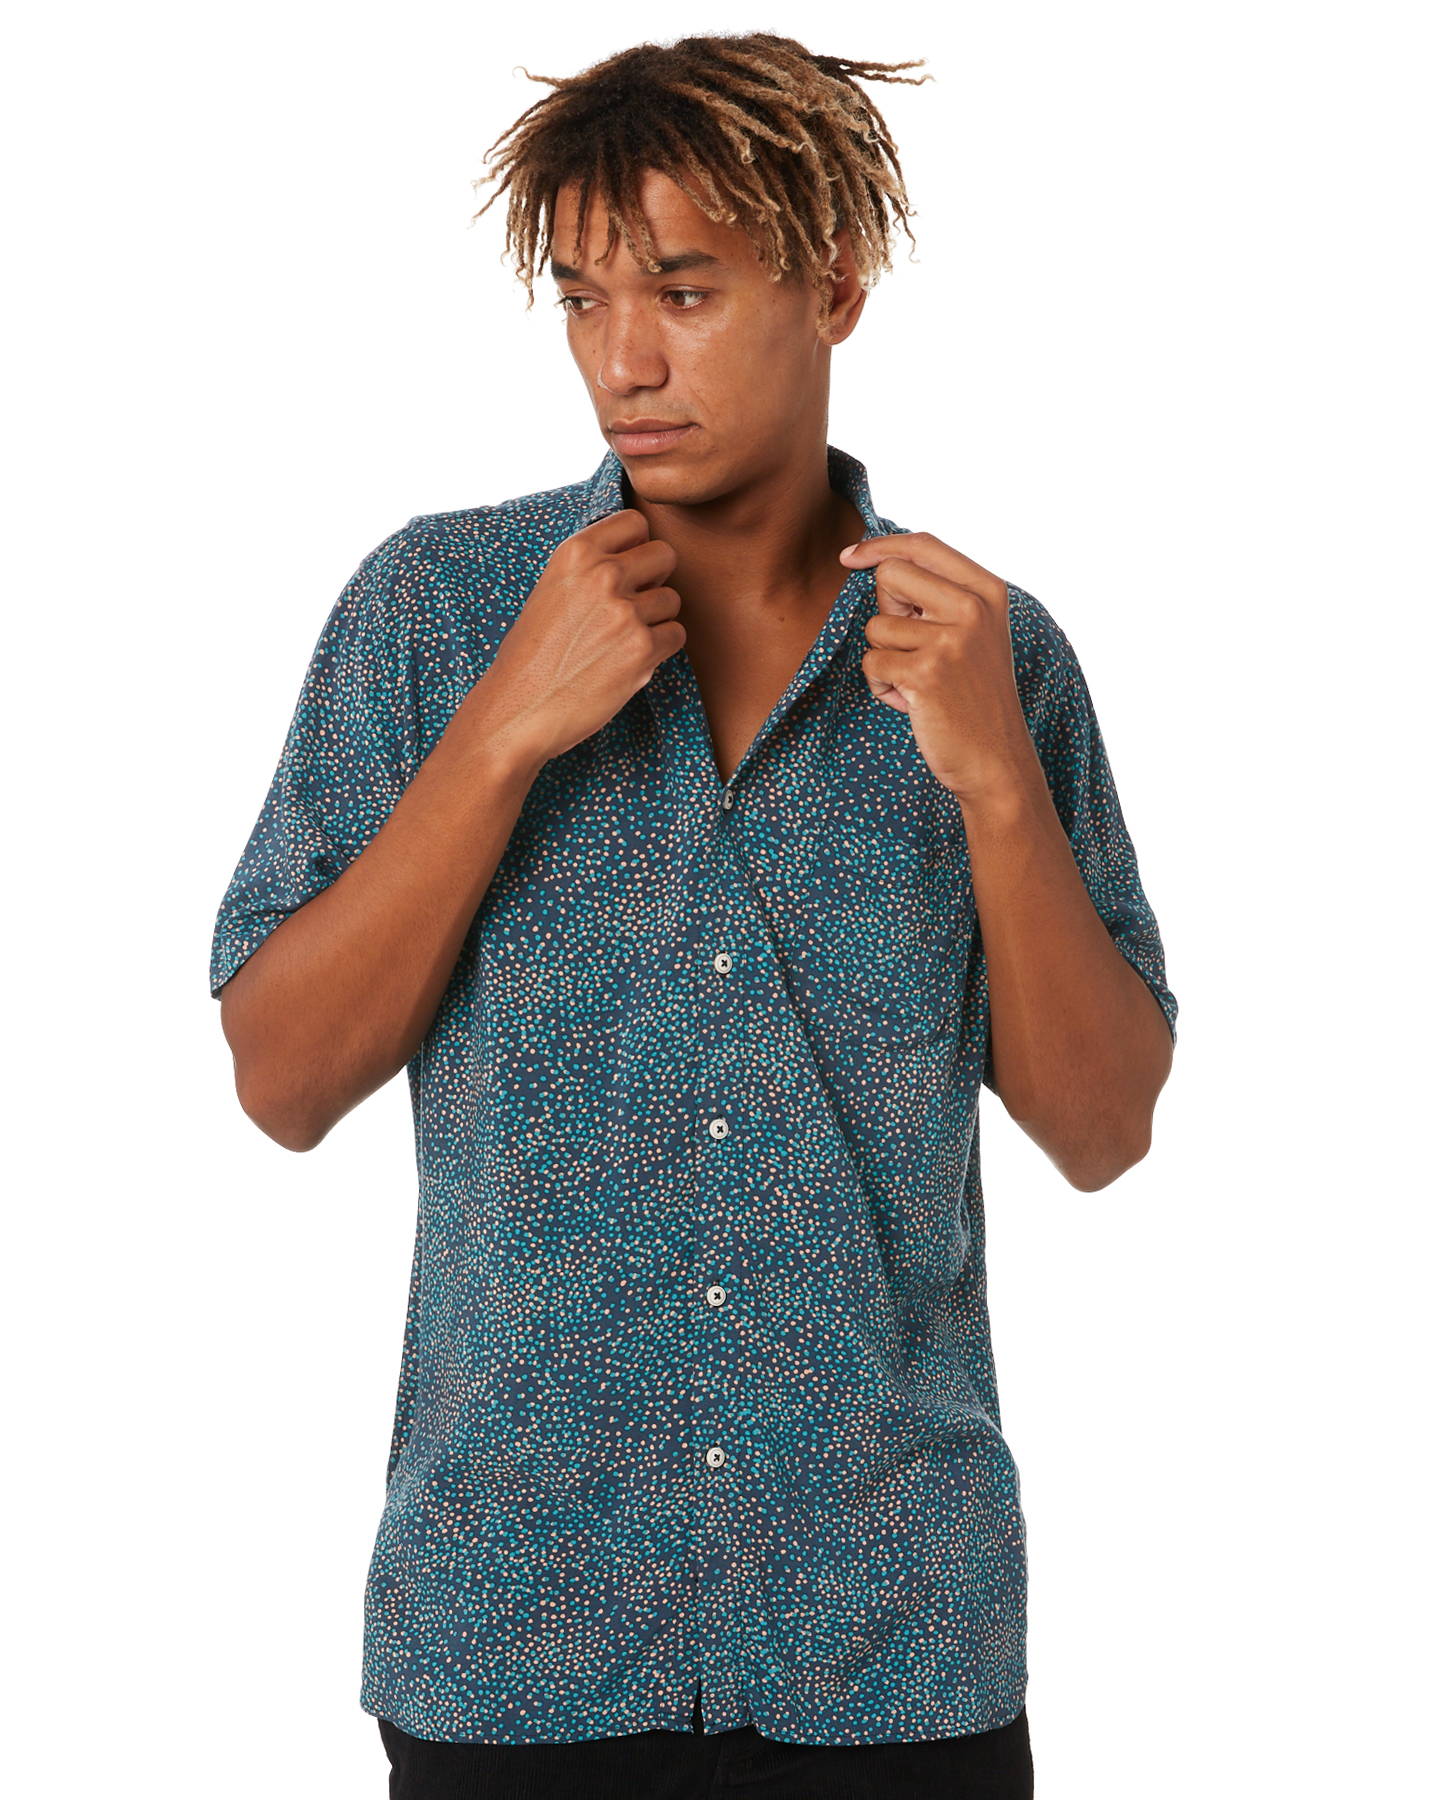 Barney Cools Holiday Mens Short-Sleeve Shirt Ditzy Ditzy